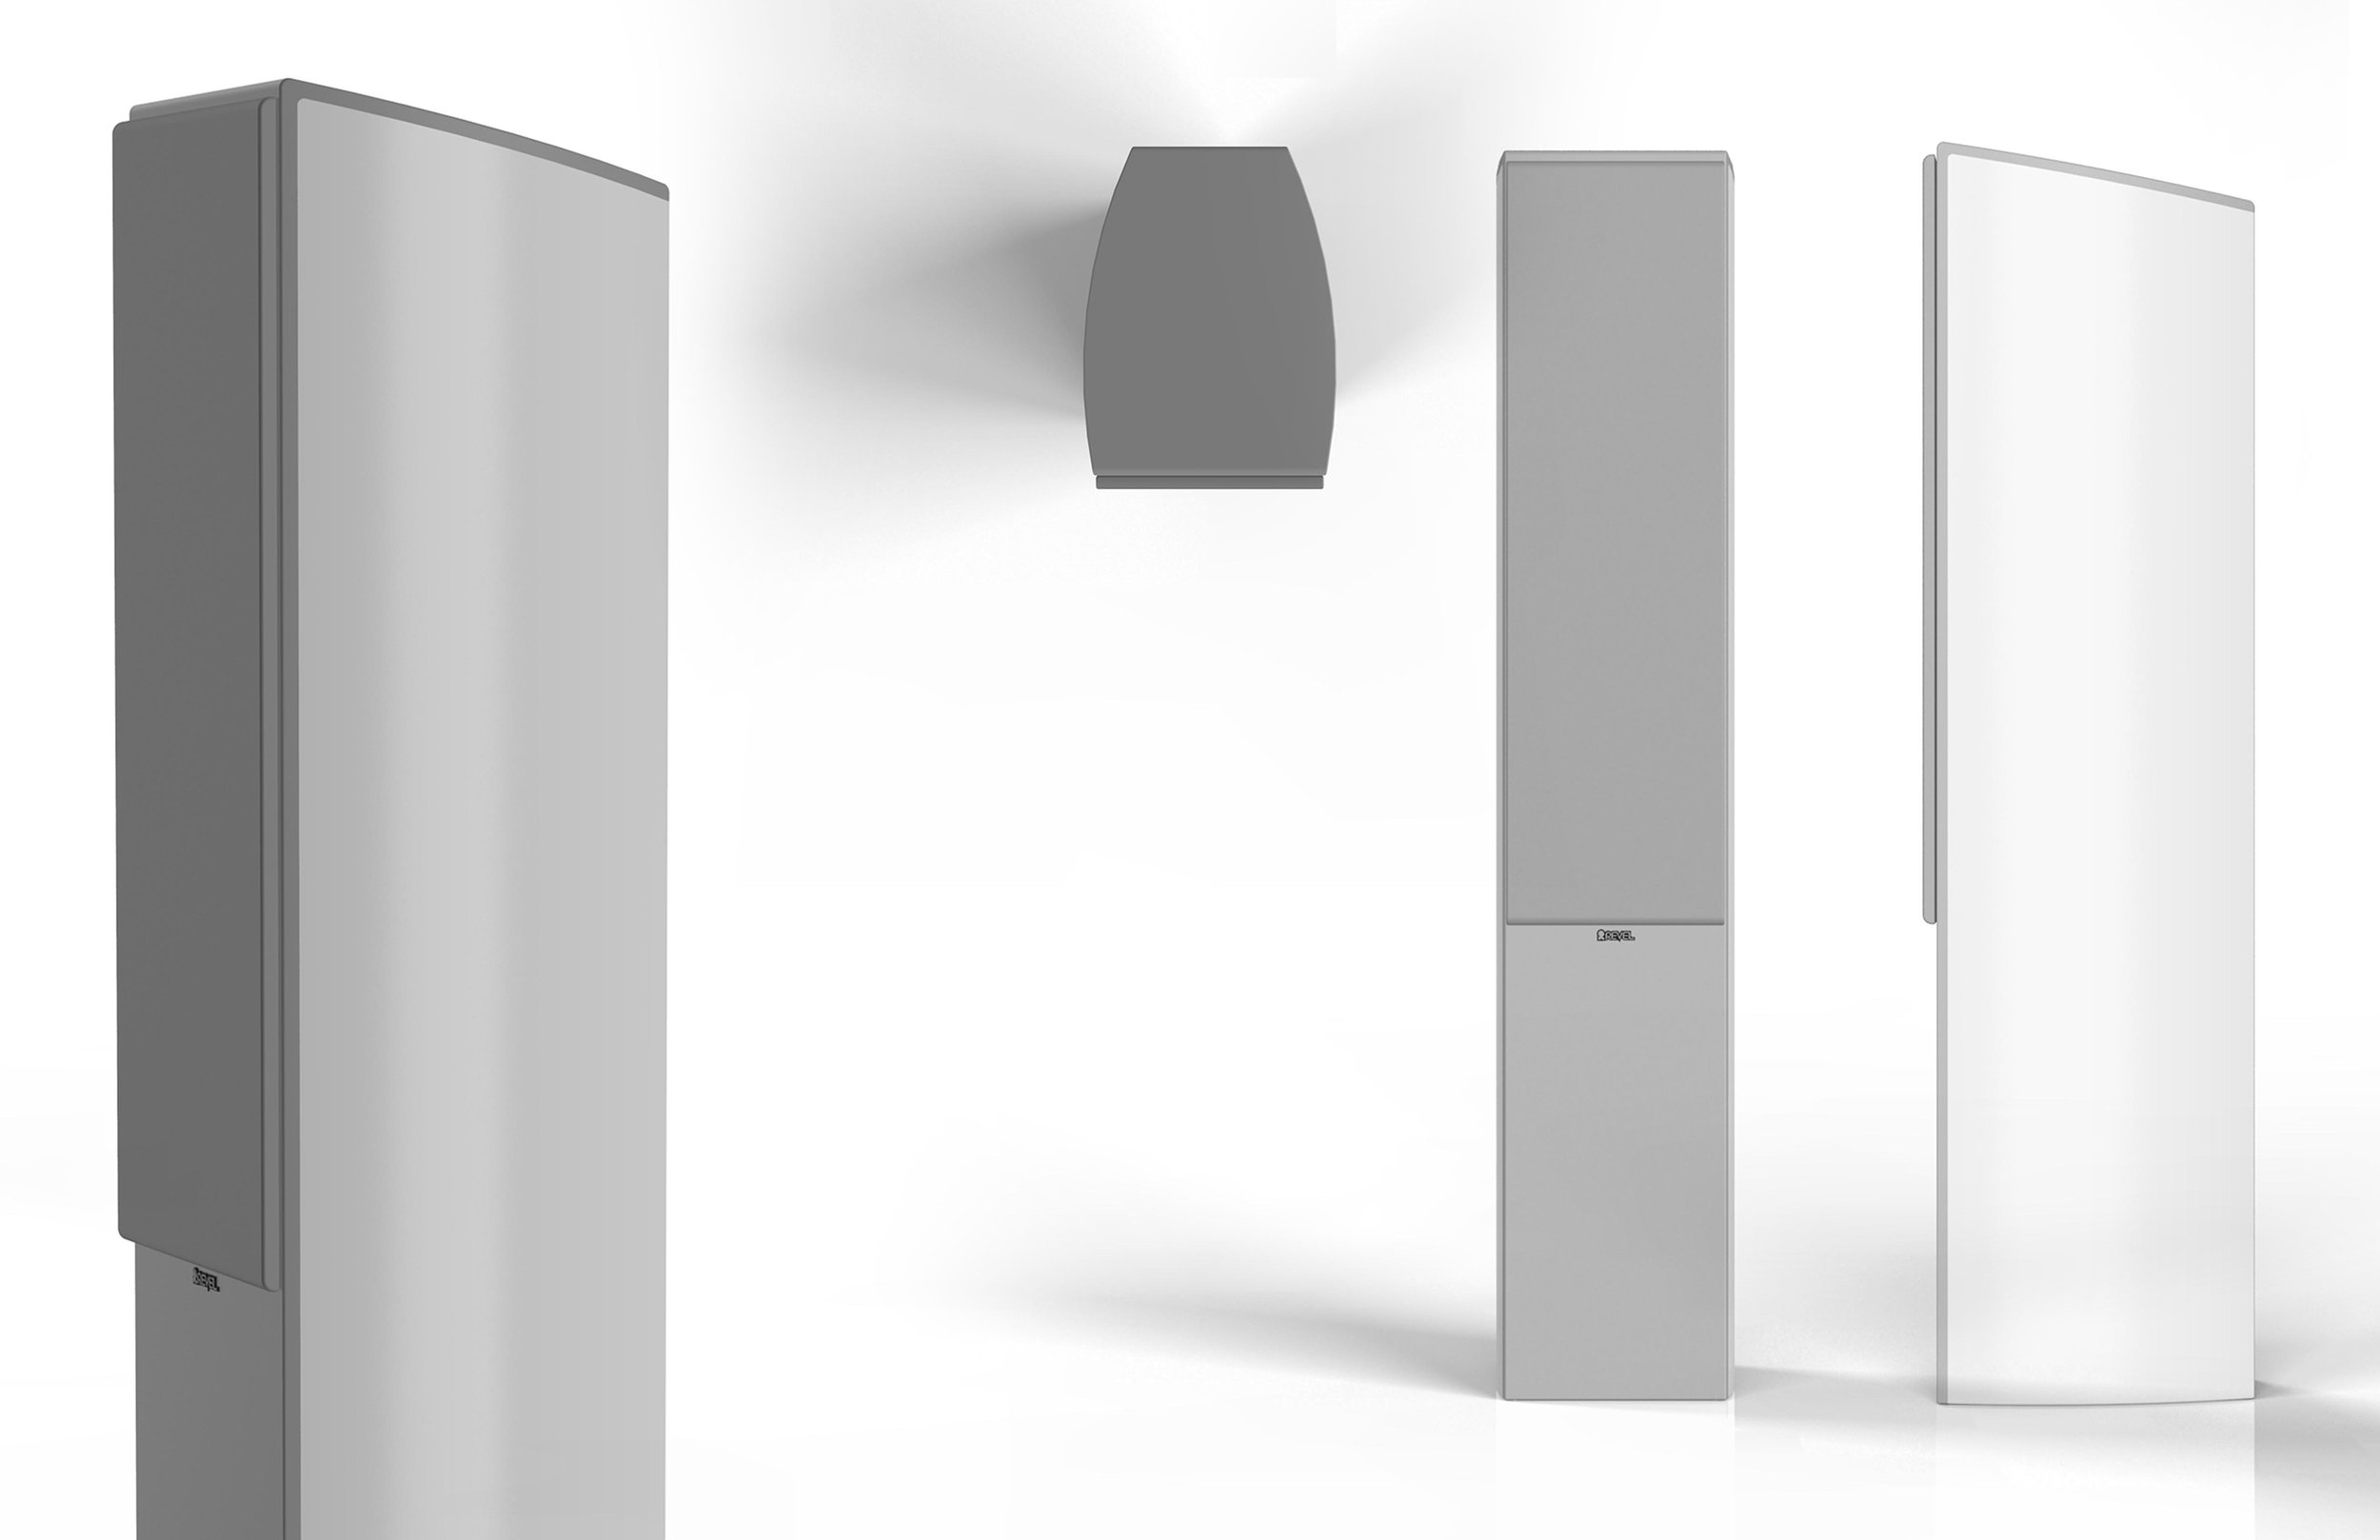 S_Concept 15B_2_Angled.jpg